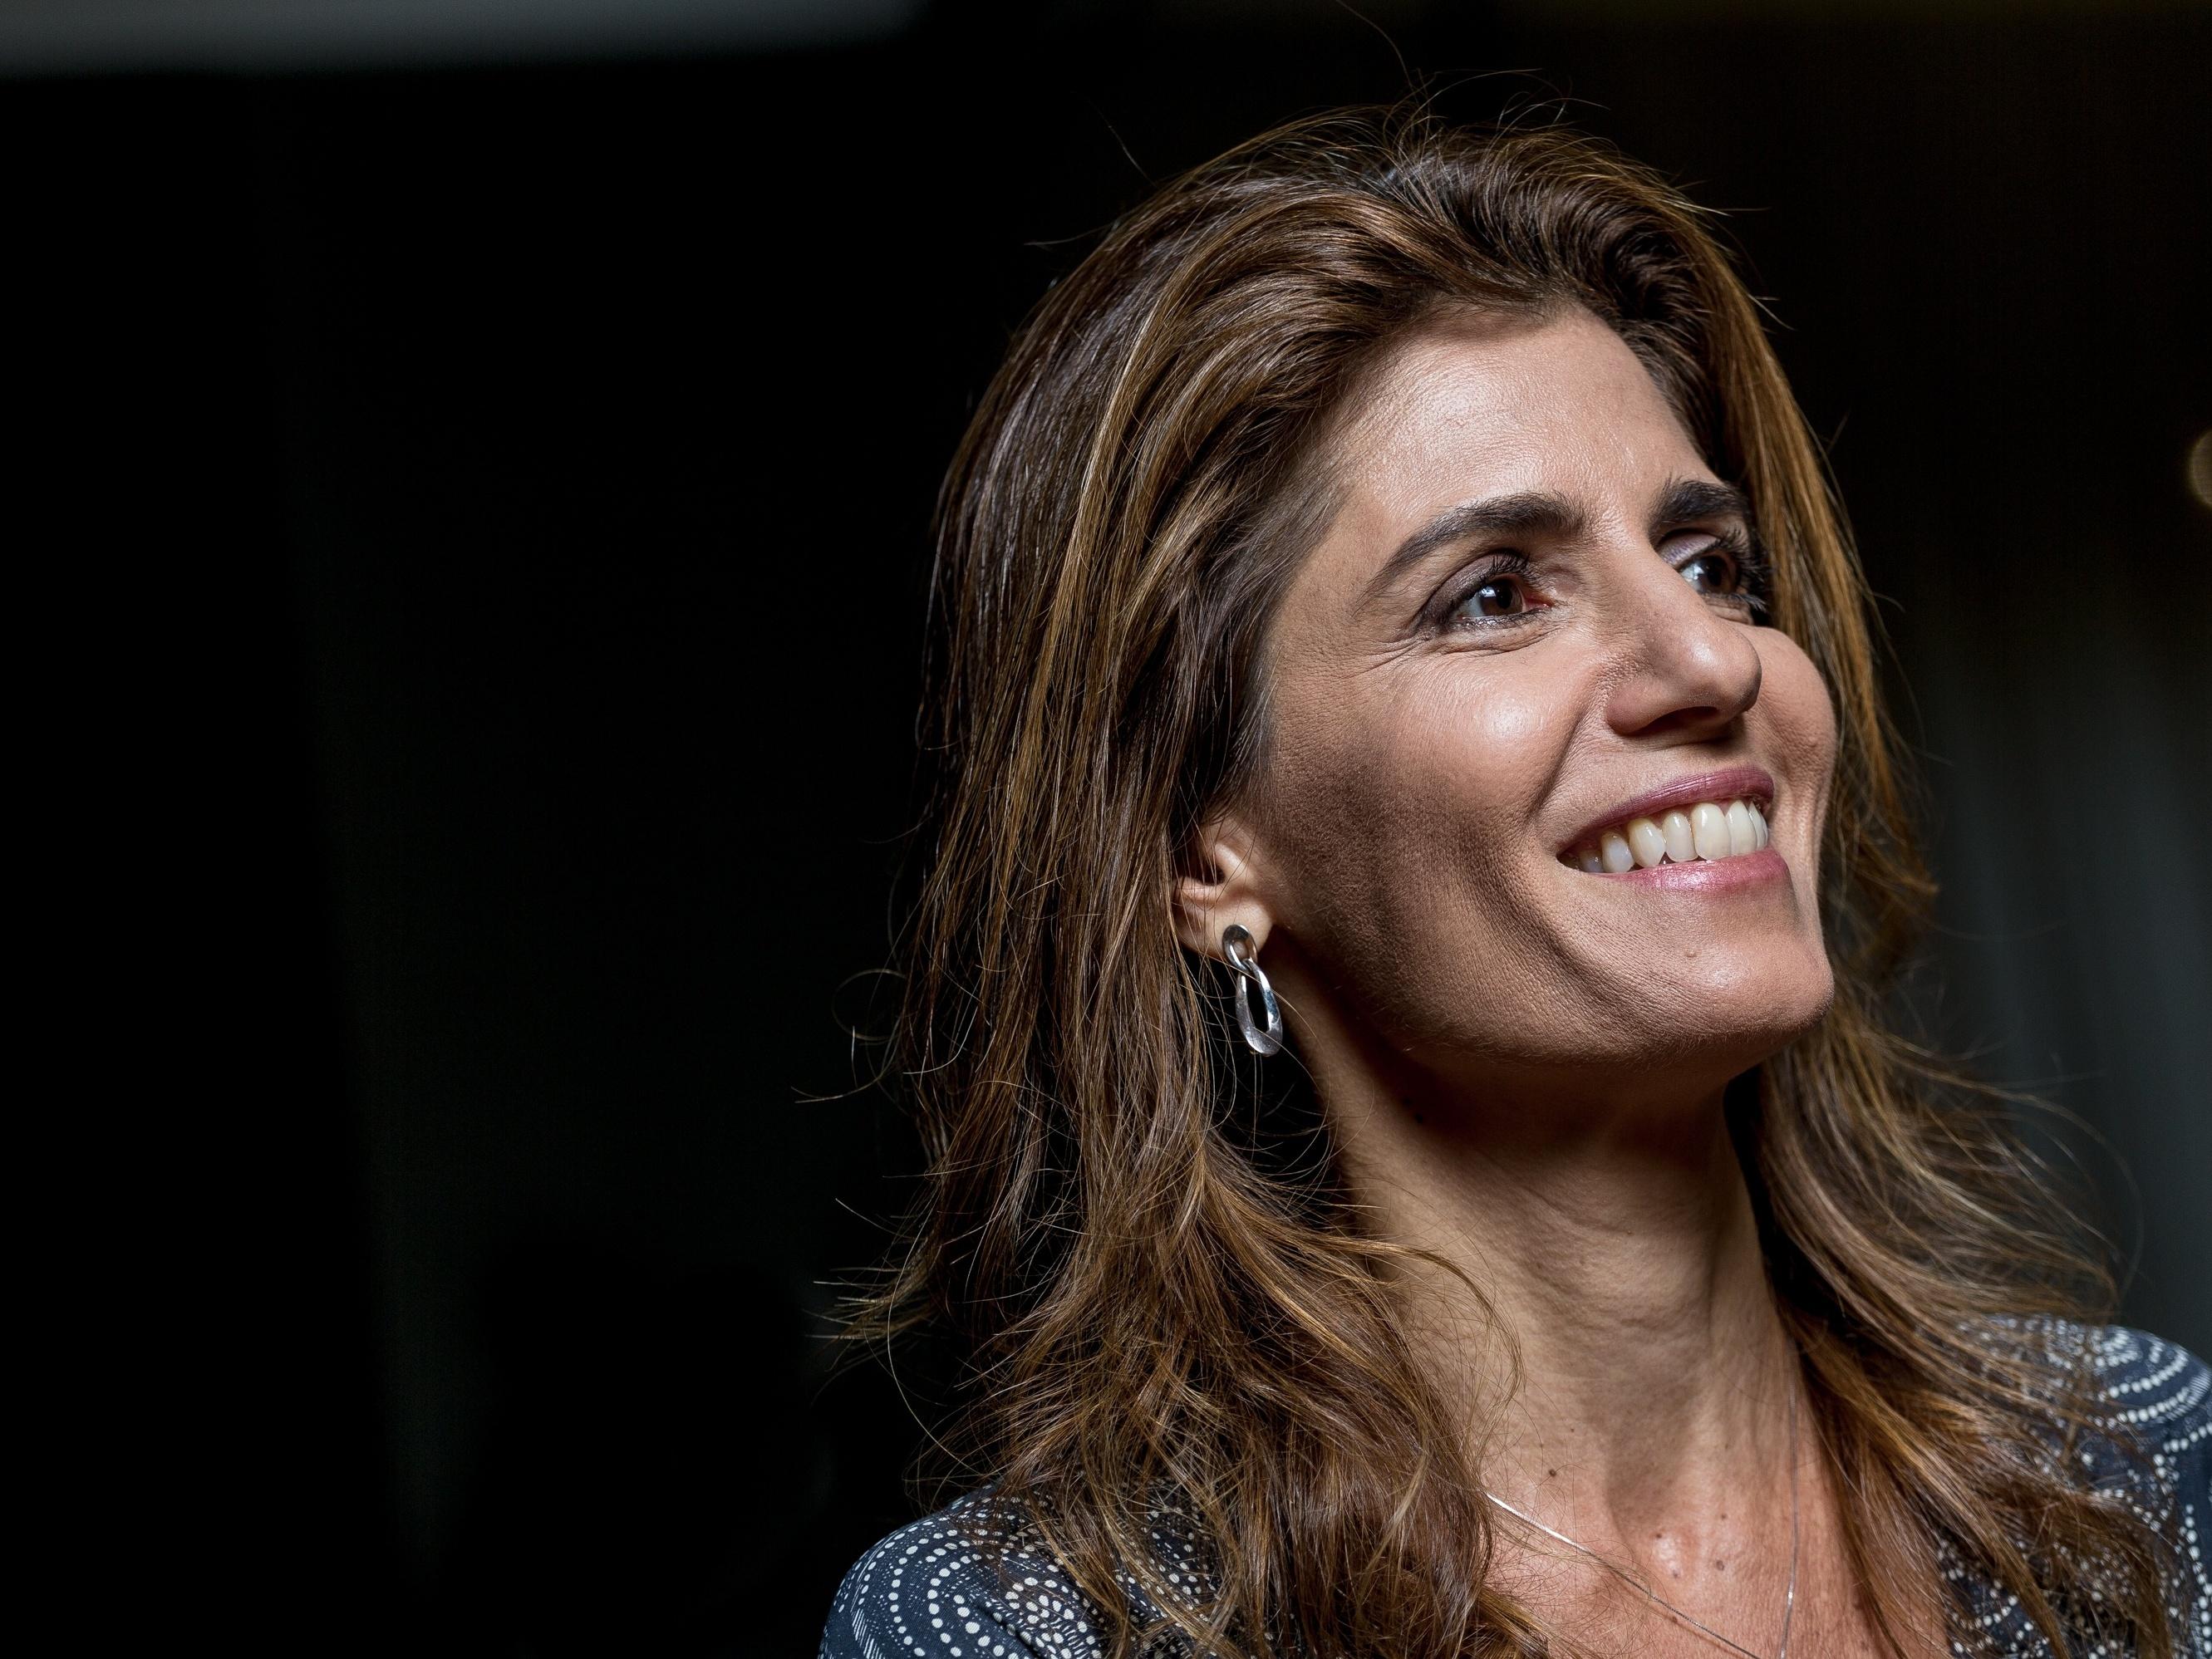 Ana Estela Haddad